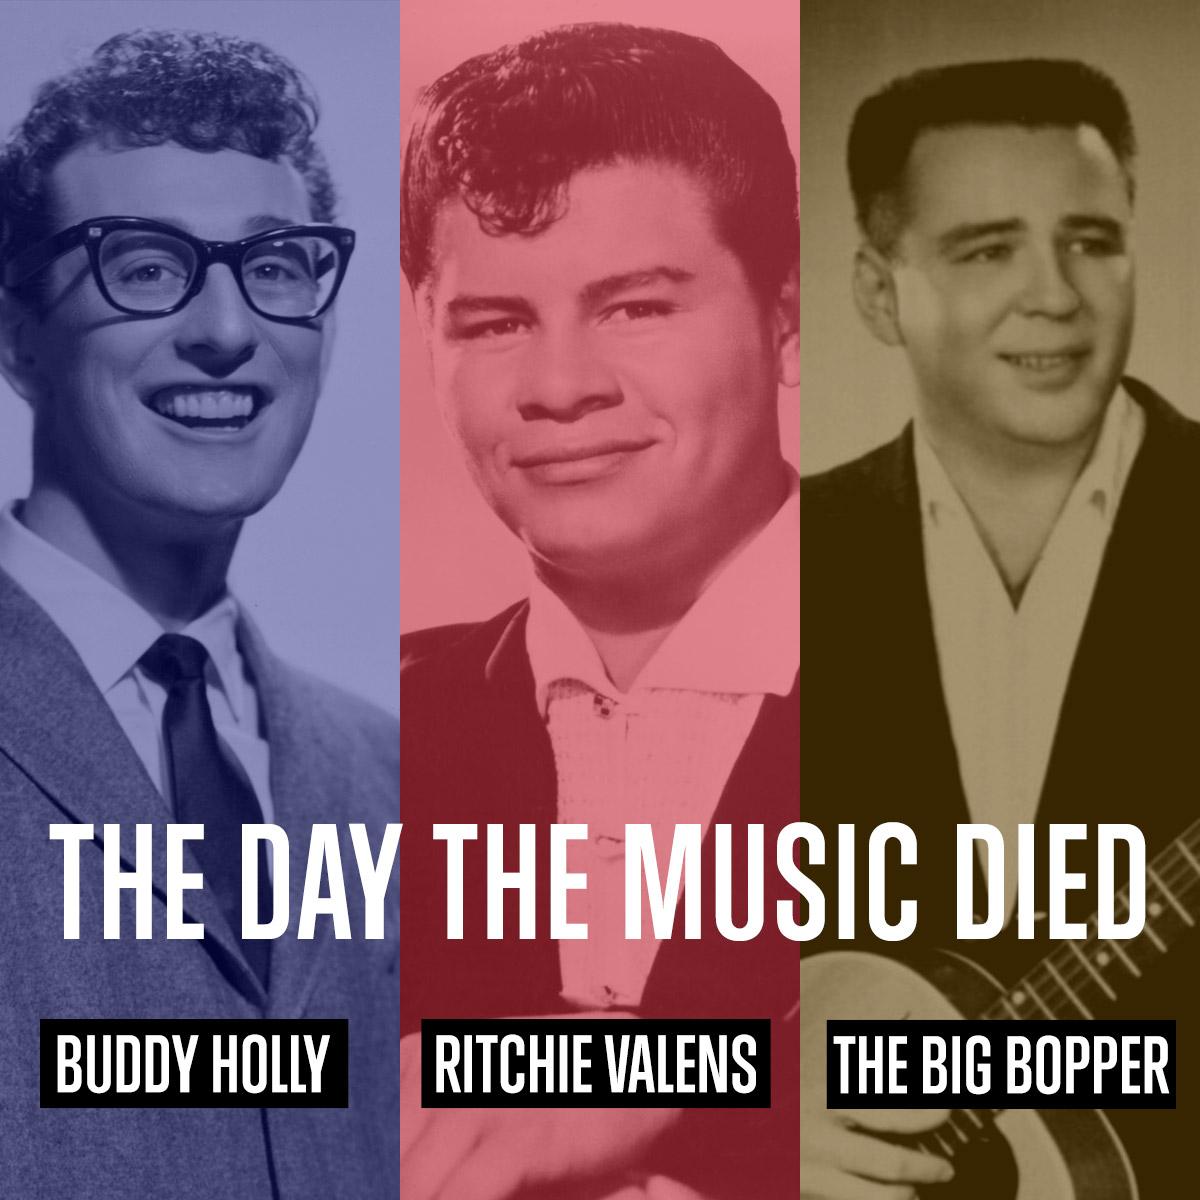 Buddy Holly, Ritchie Valens e The Big Bopper